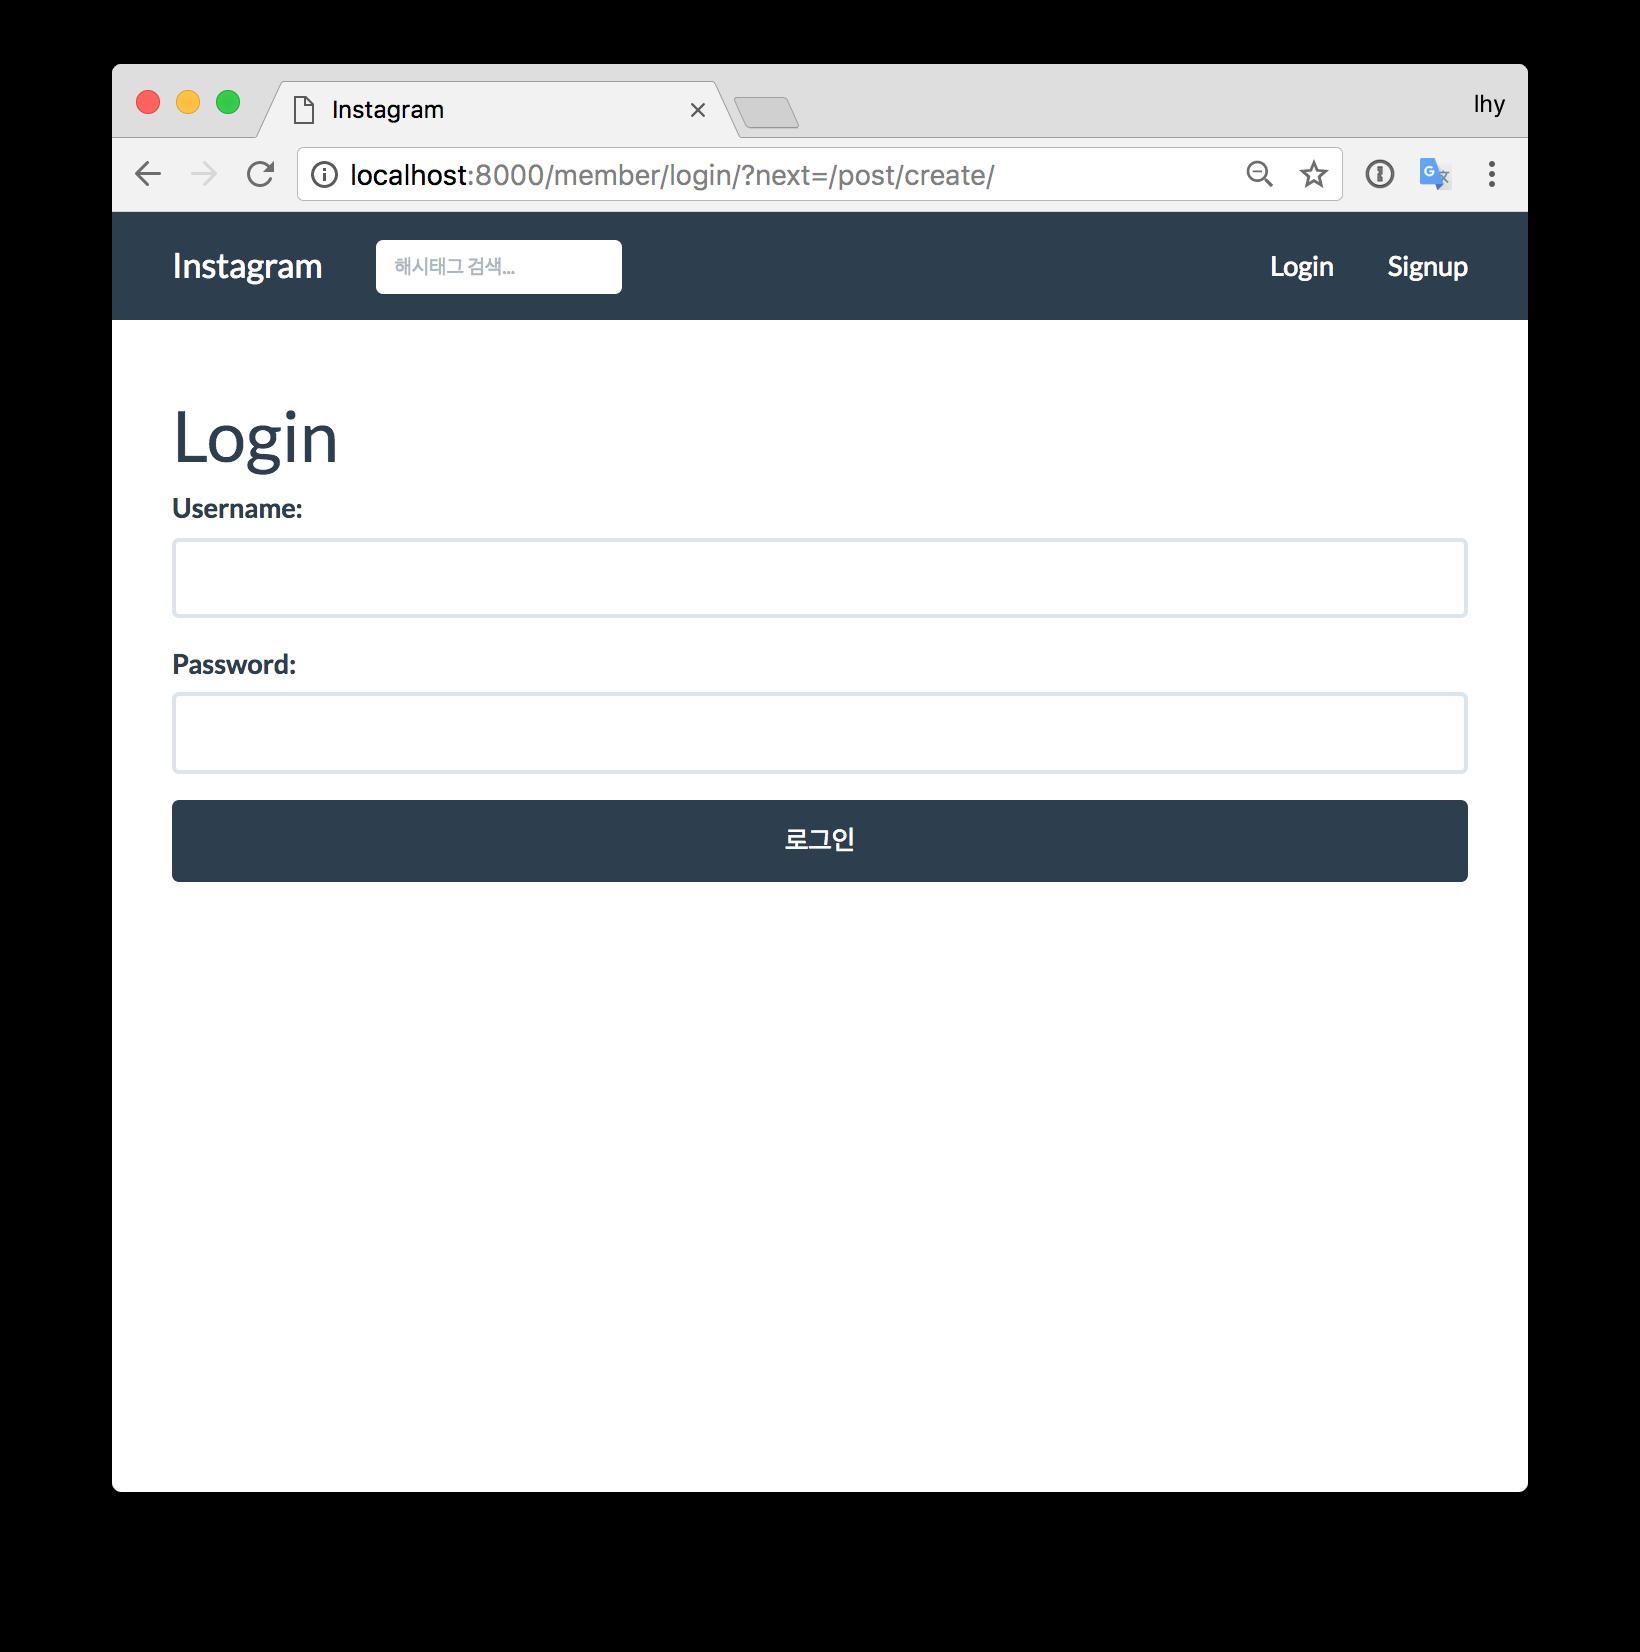 login_post_create